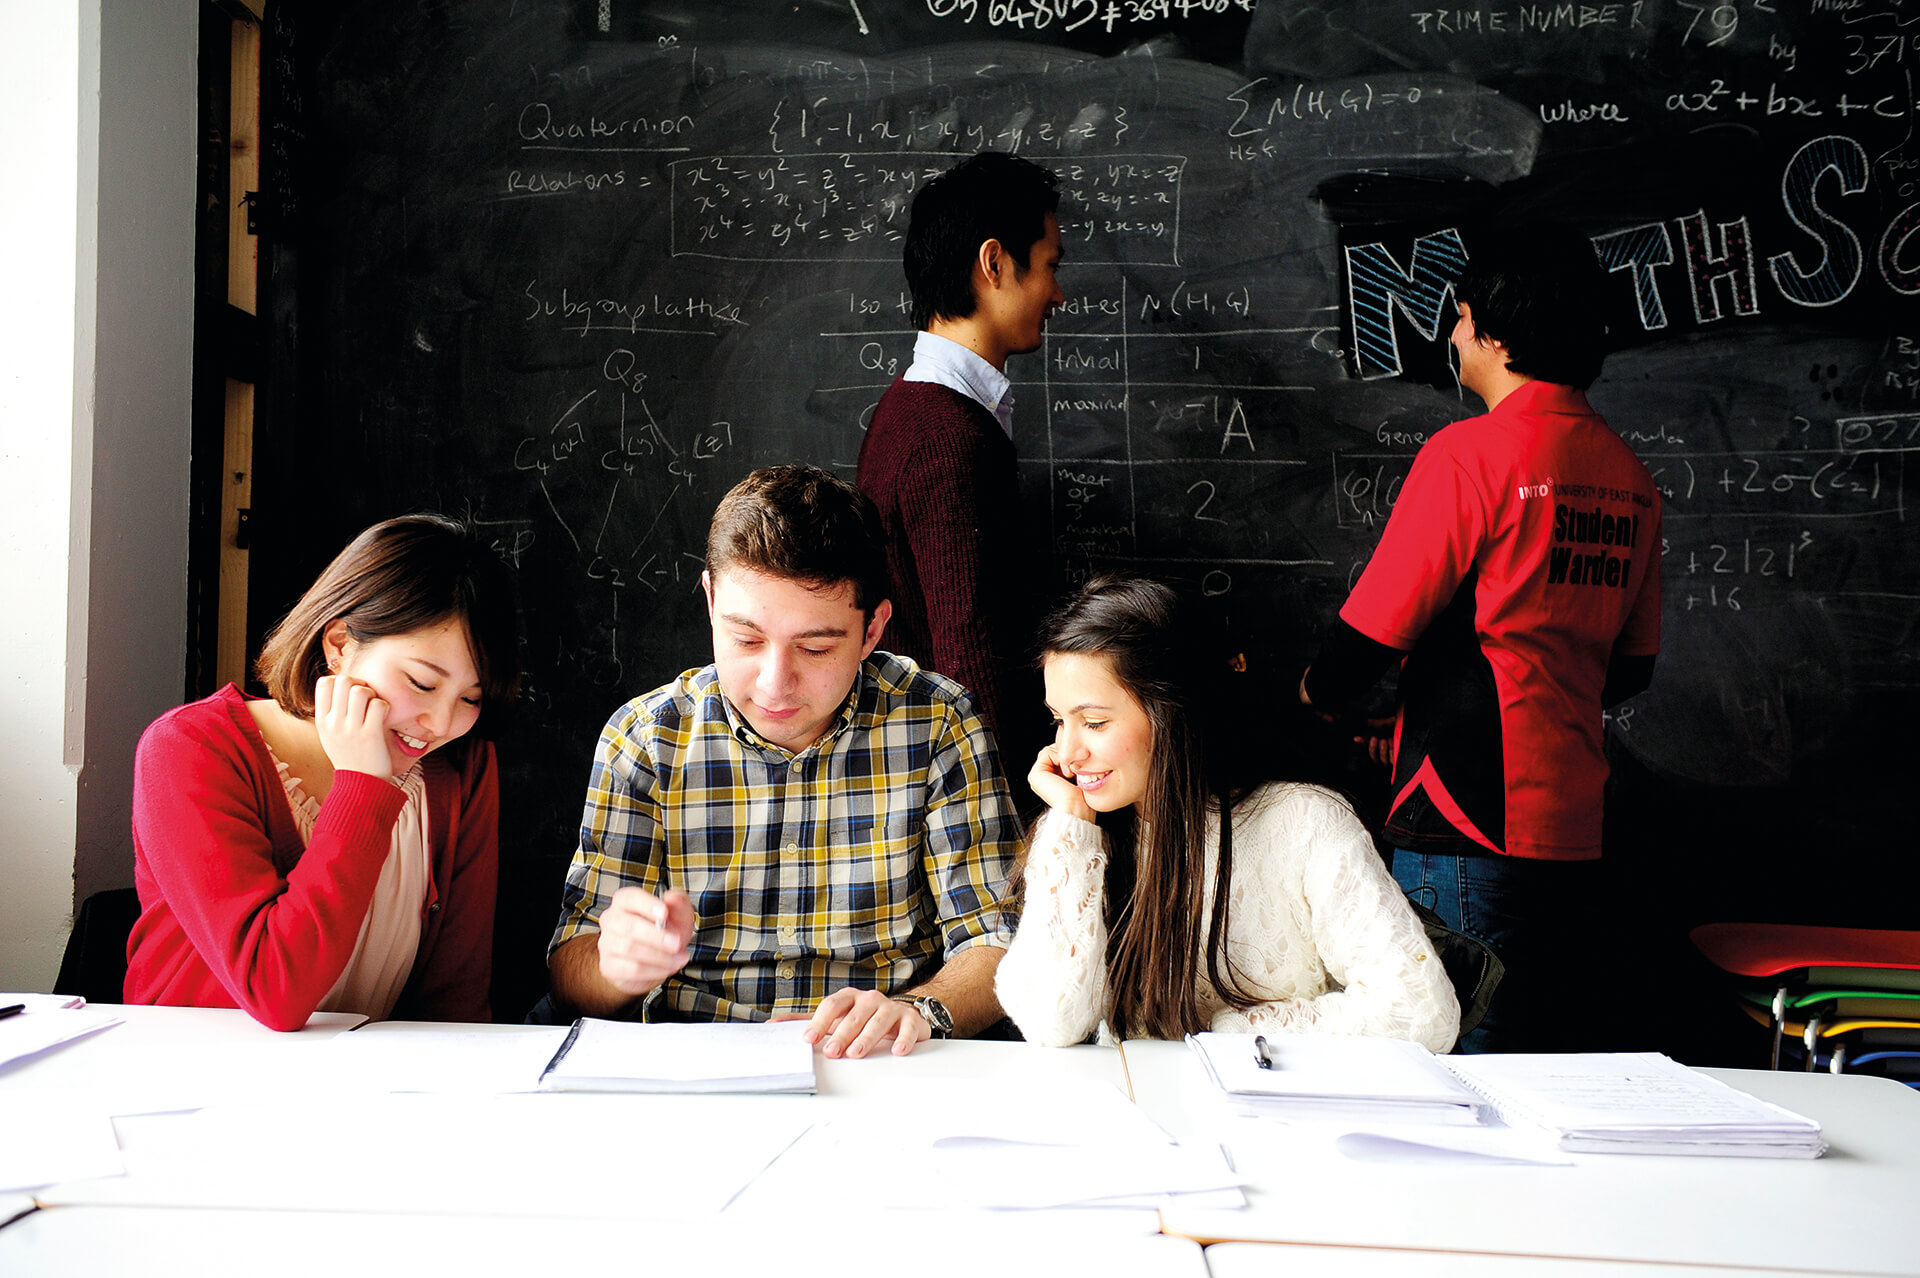 International students working in an UEA Classroom with blackboard